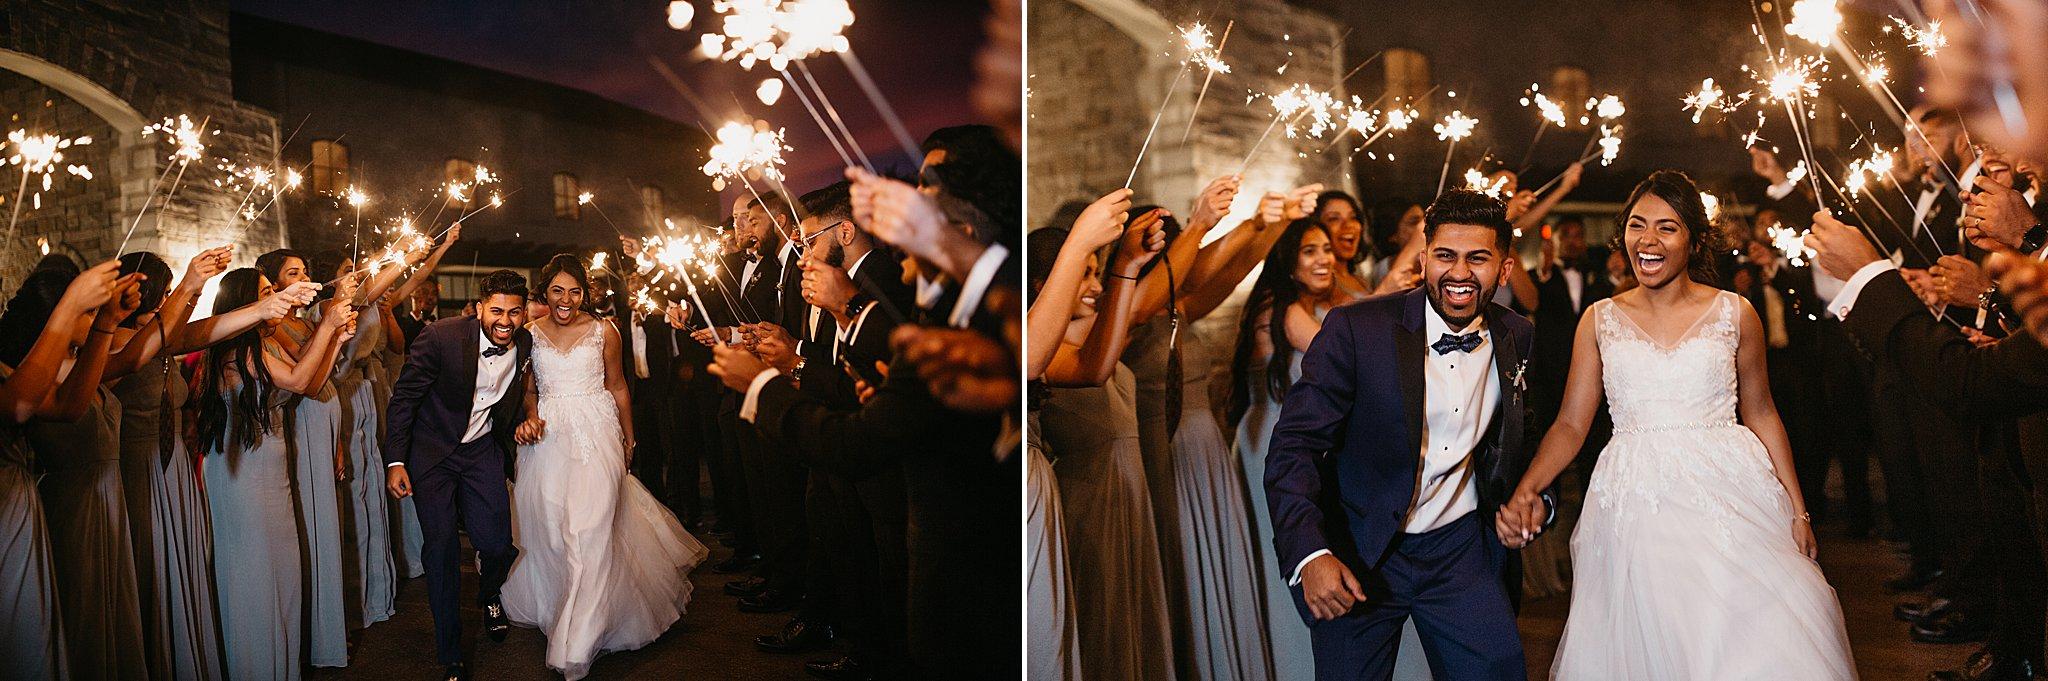 Wilderlove Co_Dripping Springs Texas_Texas Hill Country Wedding_Photography_0107.jpg